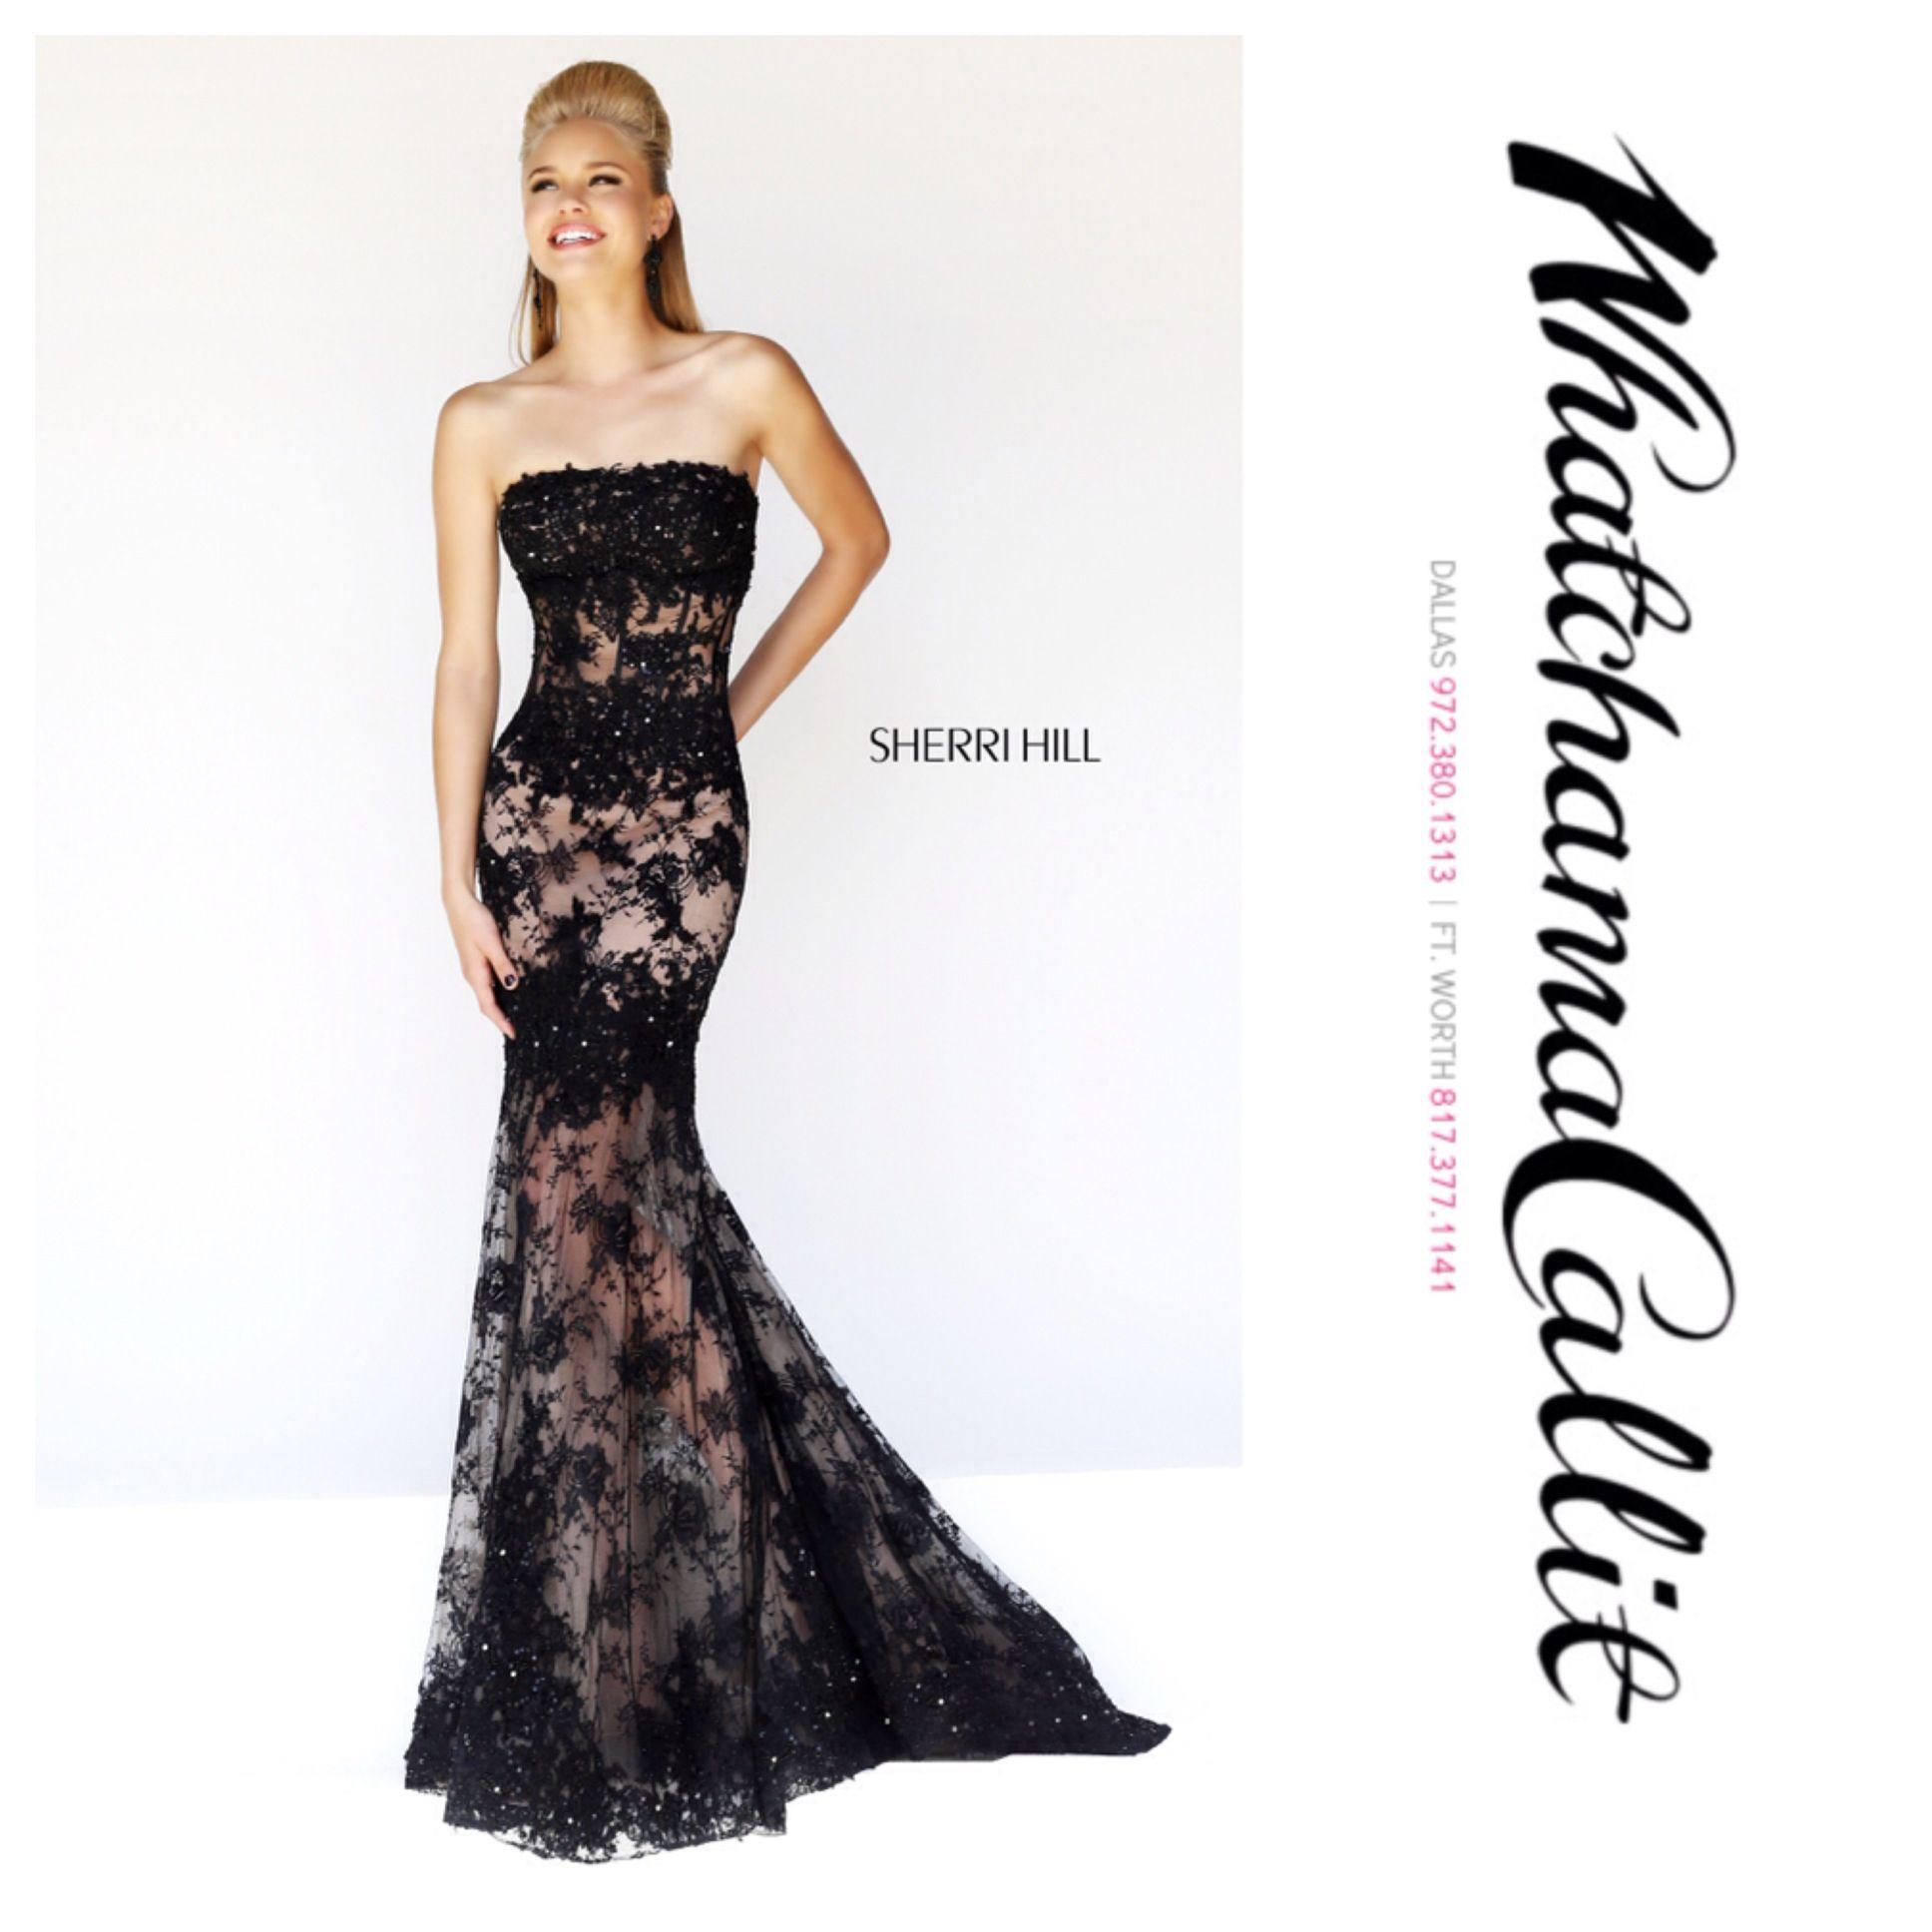 Sherri Hill dress available at Whatchamacallit Boutique for #prom2014 #promdresses #sherrihill #sherrihilldress